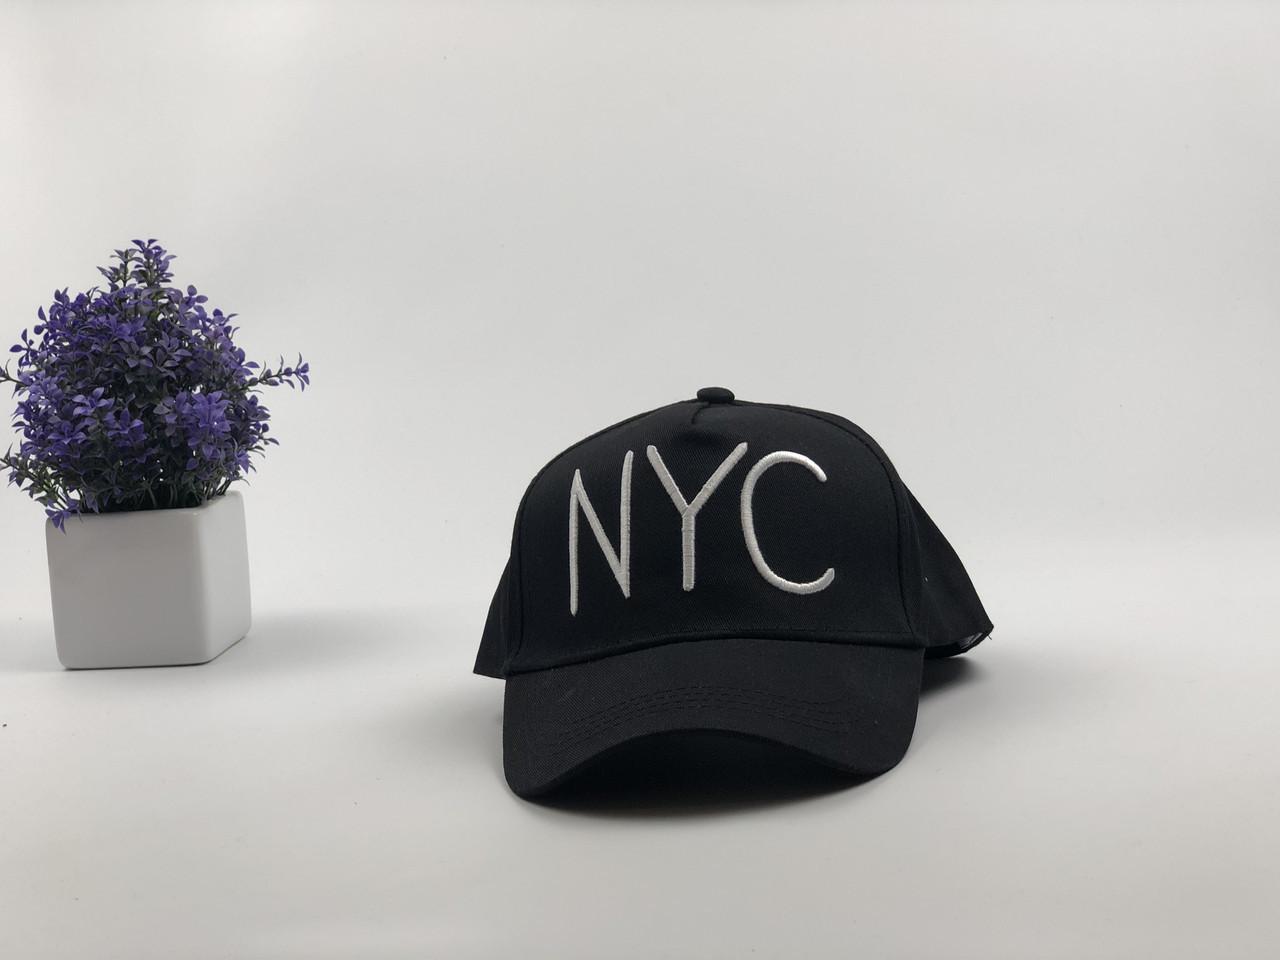 Кепка бейсболка NYC (черная)